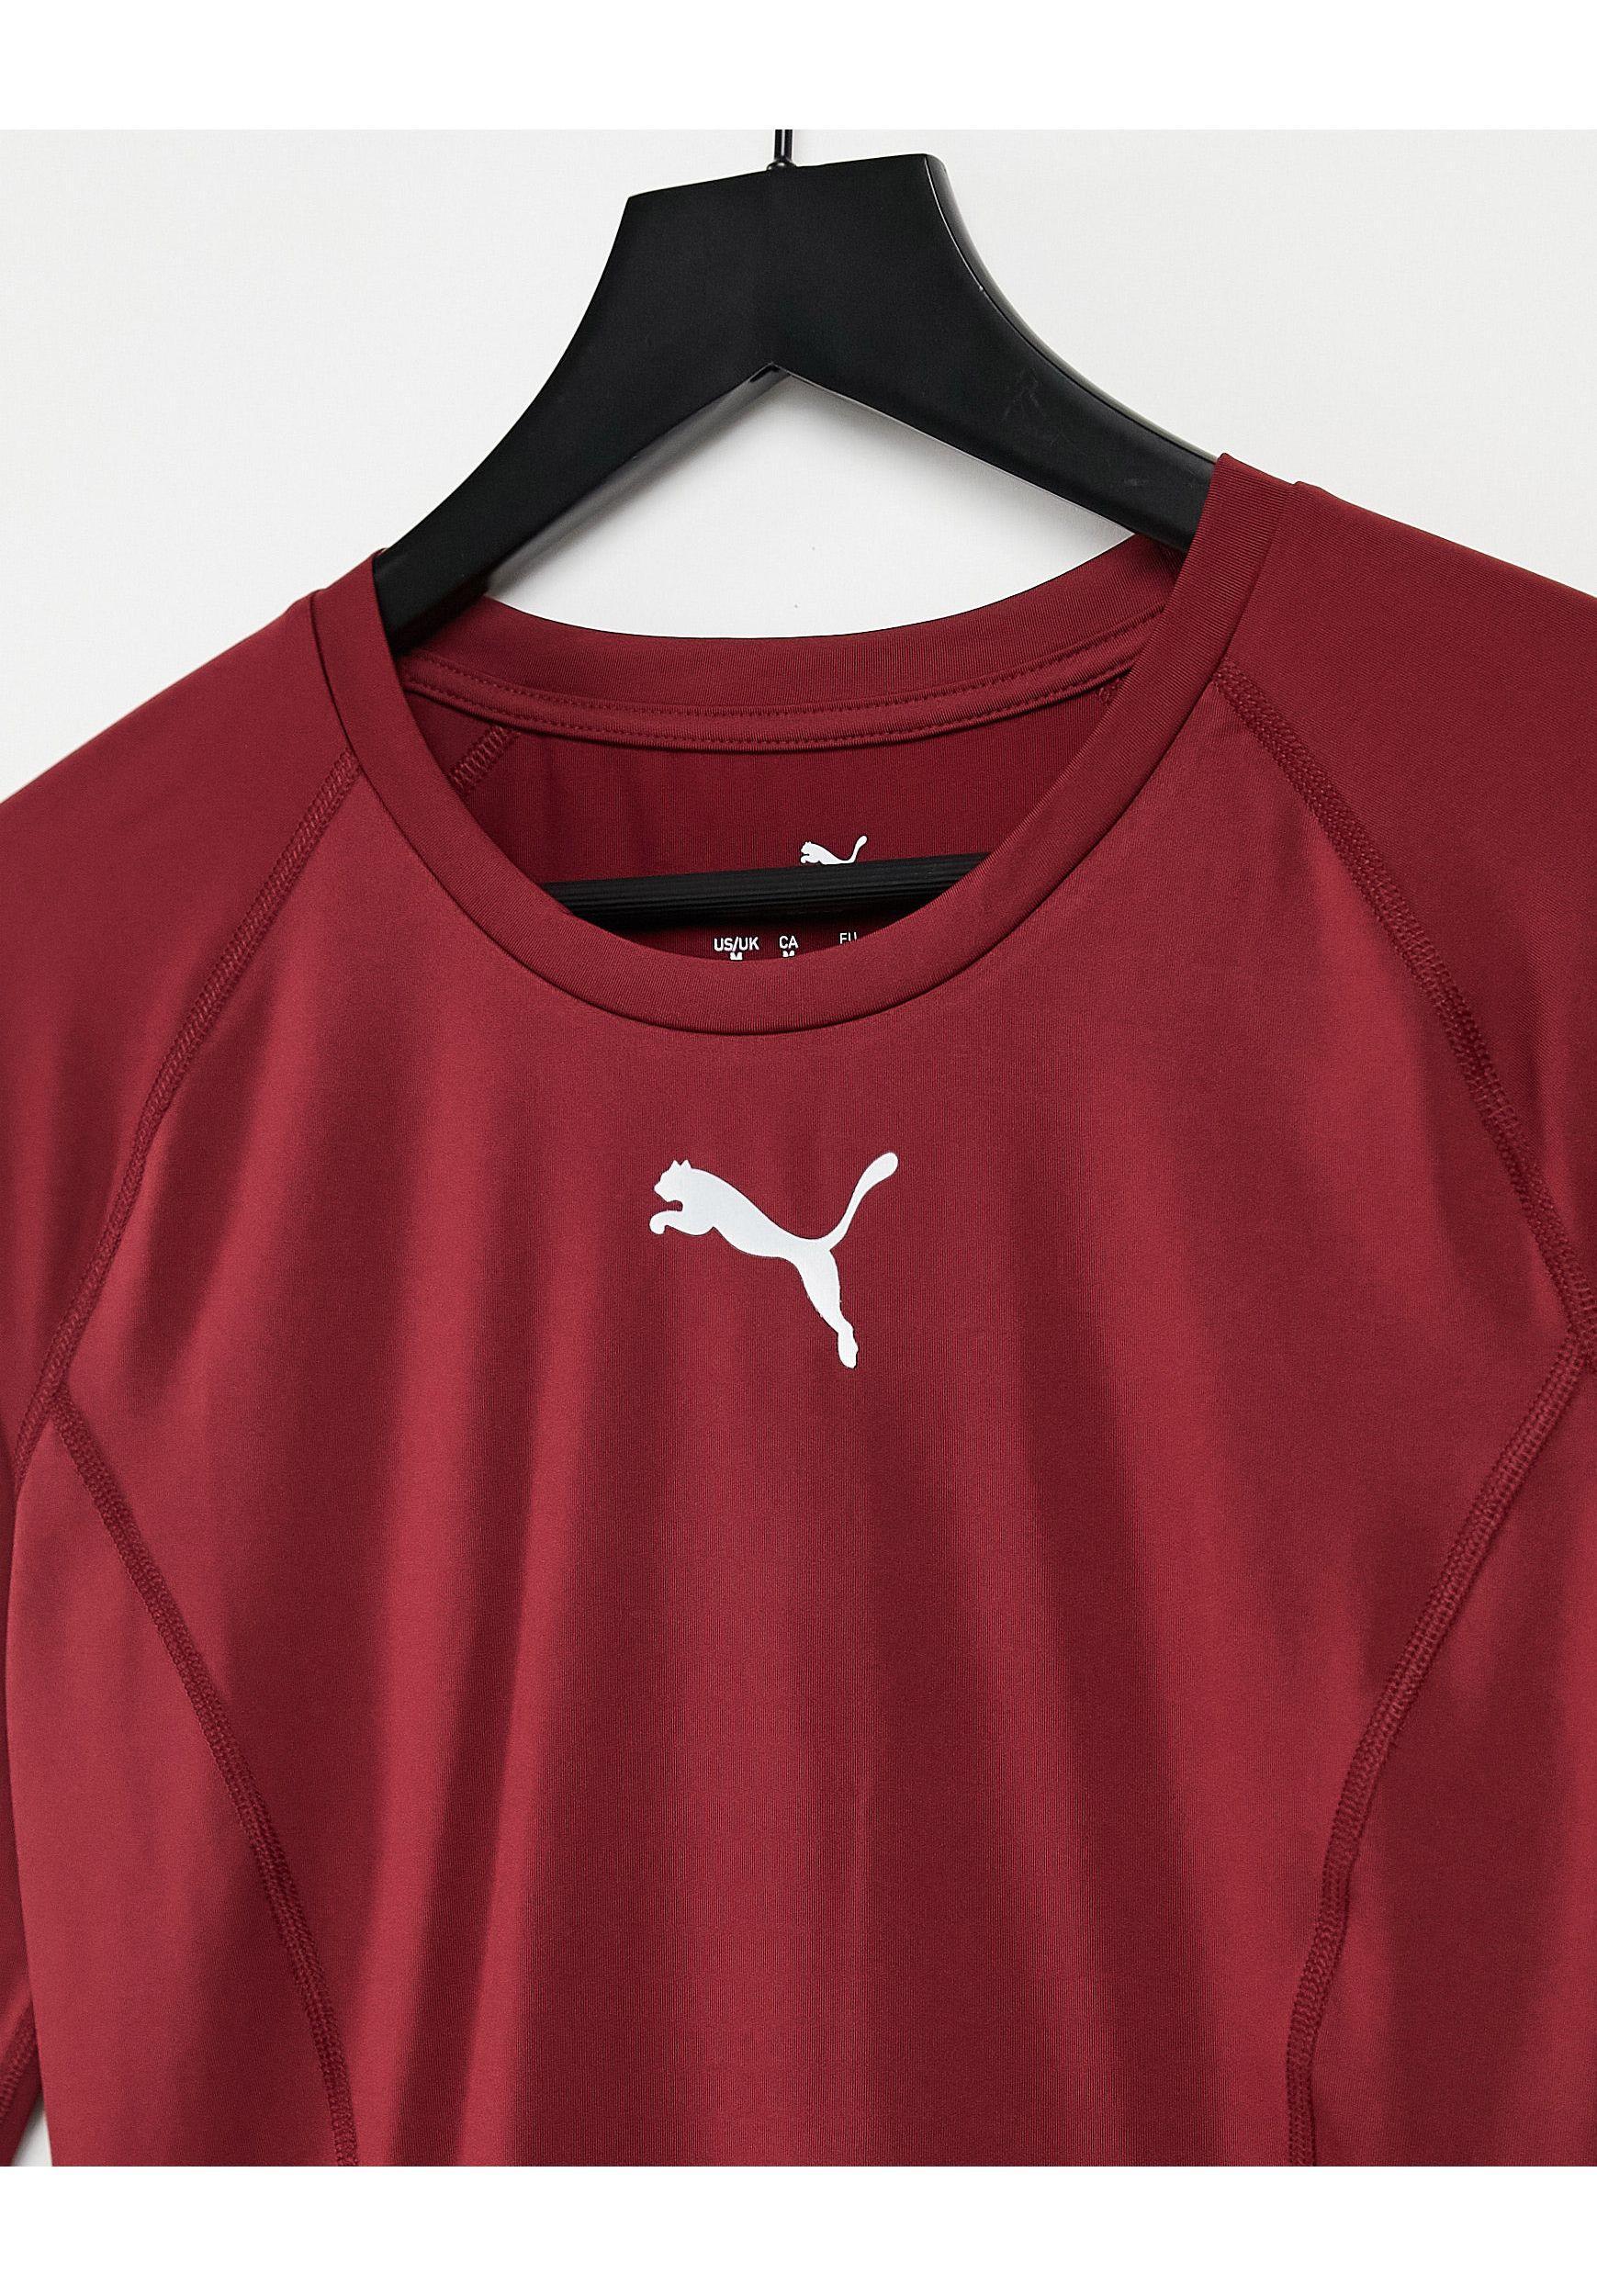 PUMA Liga Long-sleeved Baselayer T-shirt in Red for Men - Lyst